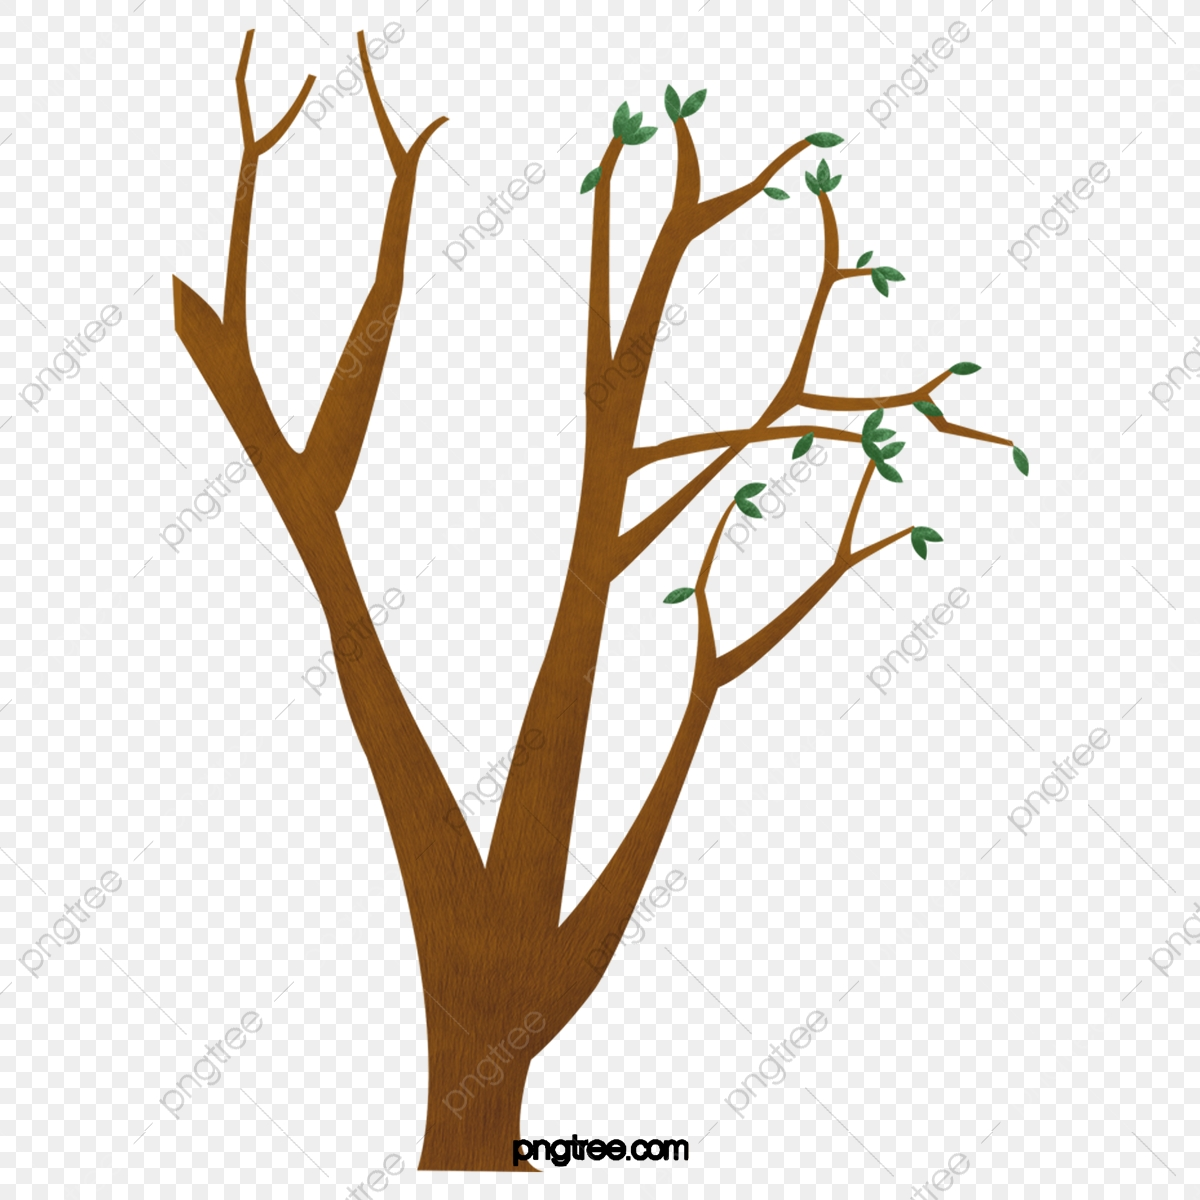 Tree, Branch, Leaves, Green, Branches, Leaf - La Rama De Un Arbol Clipart  (#356183) - PinClipart